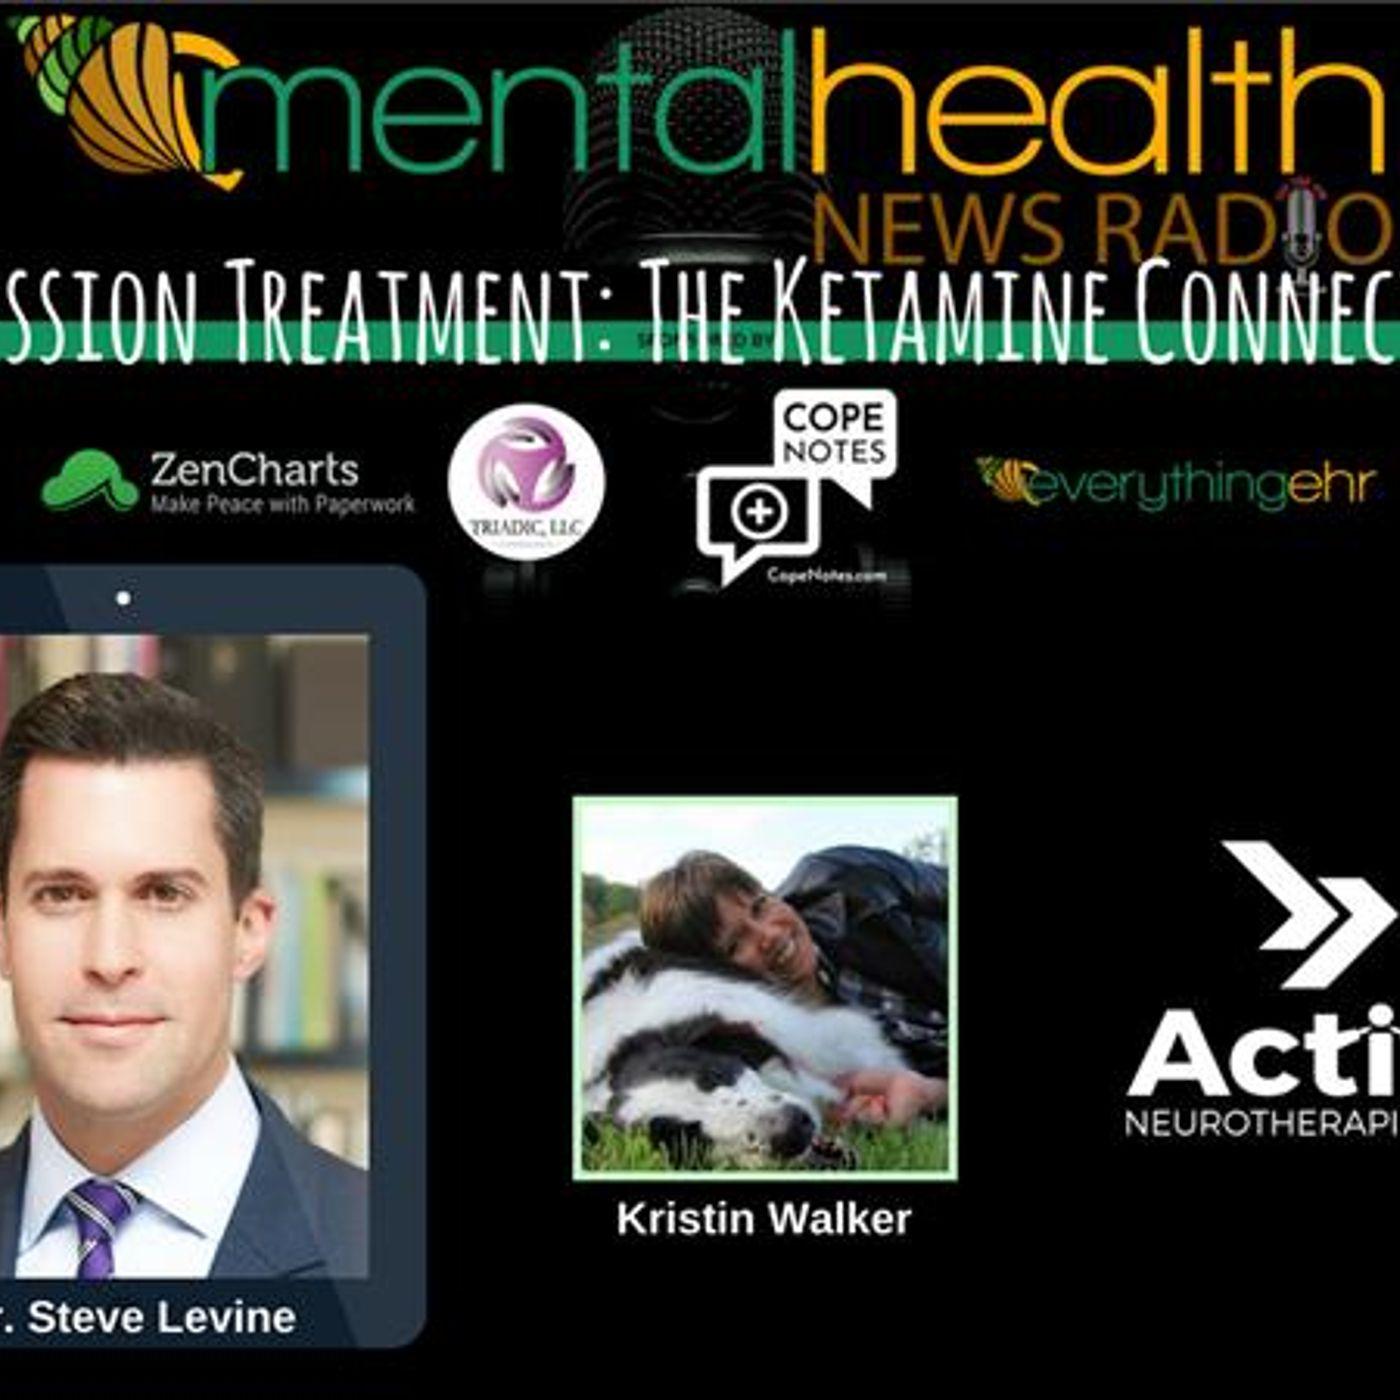 Mental Health News Radio - Depression Treatment: The Ketamine Connection with Dr. Steven Levine